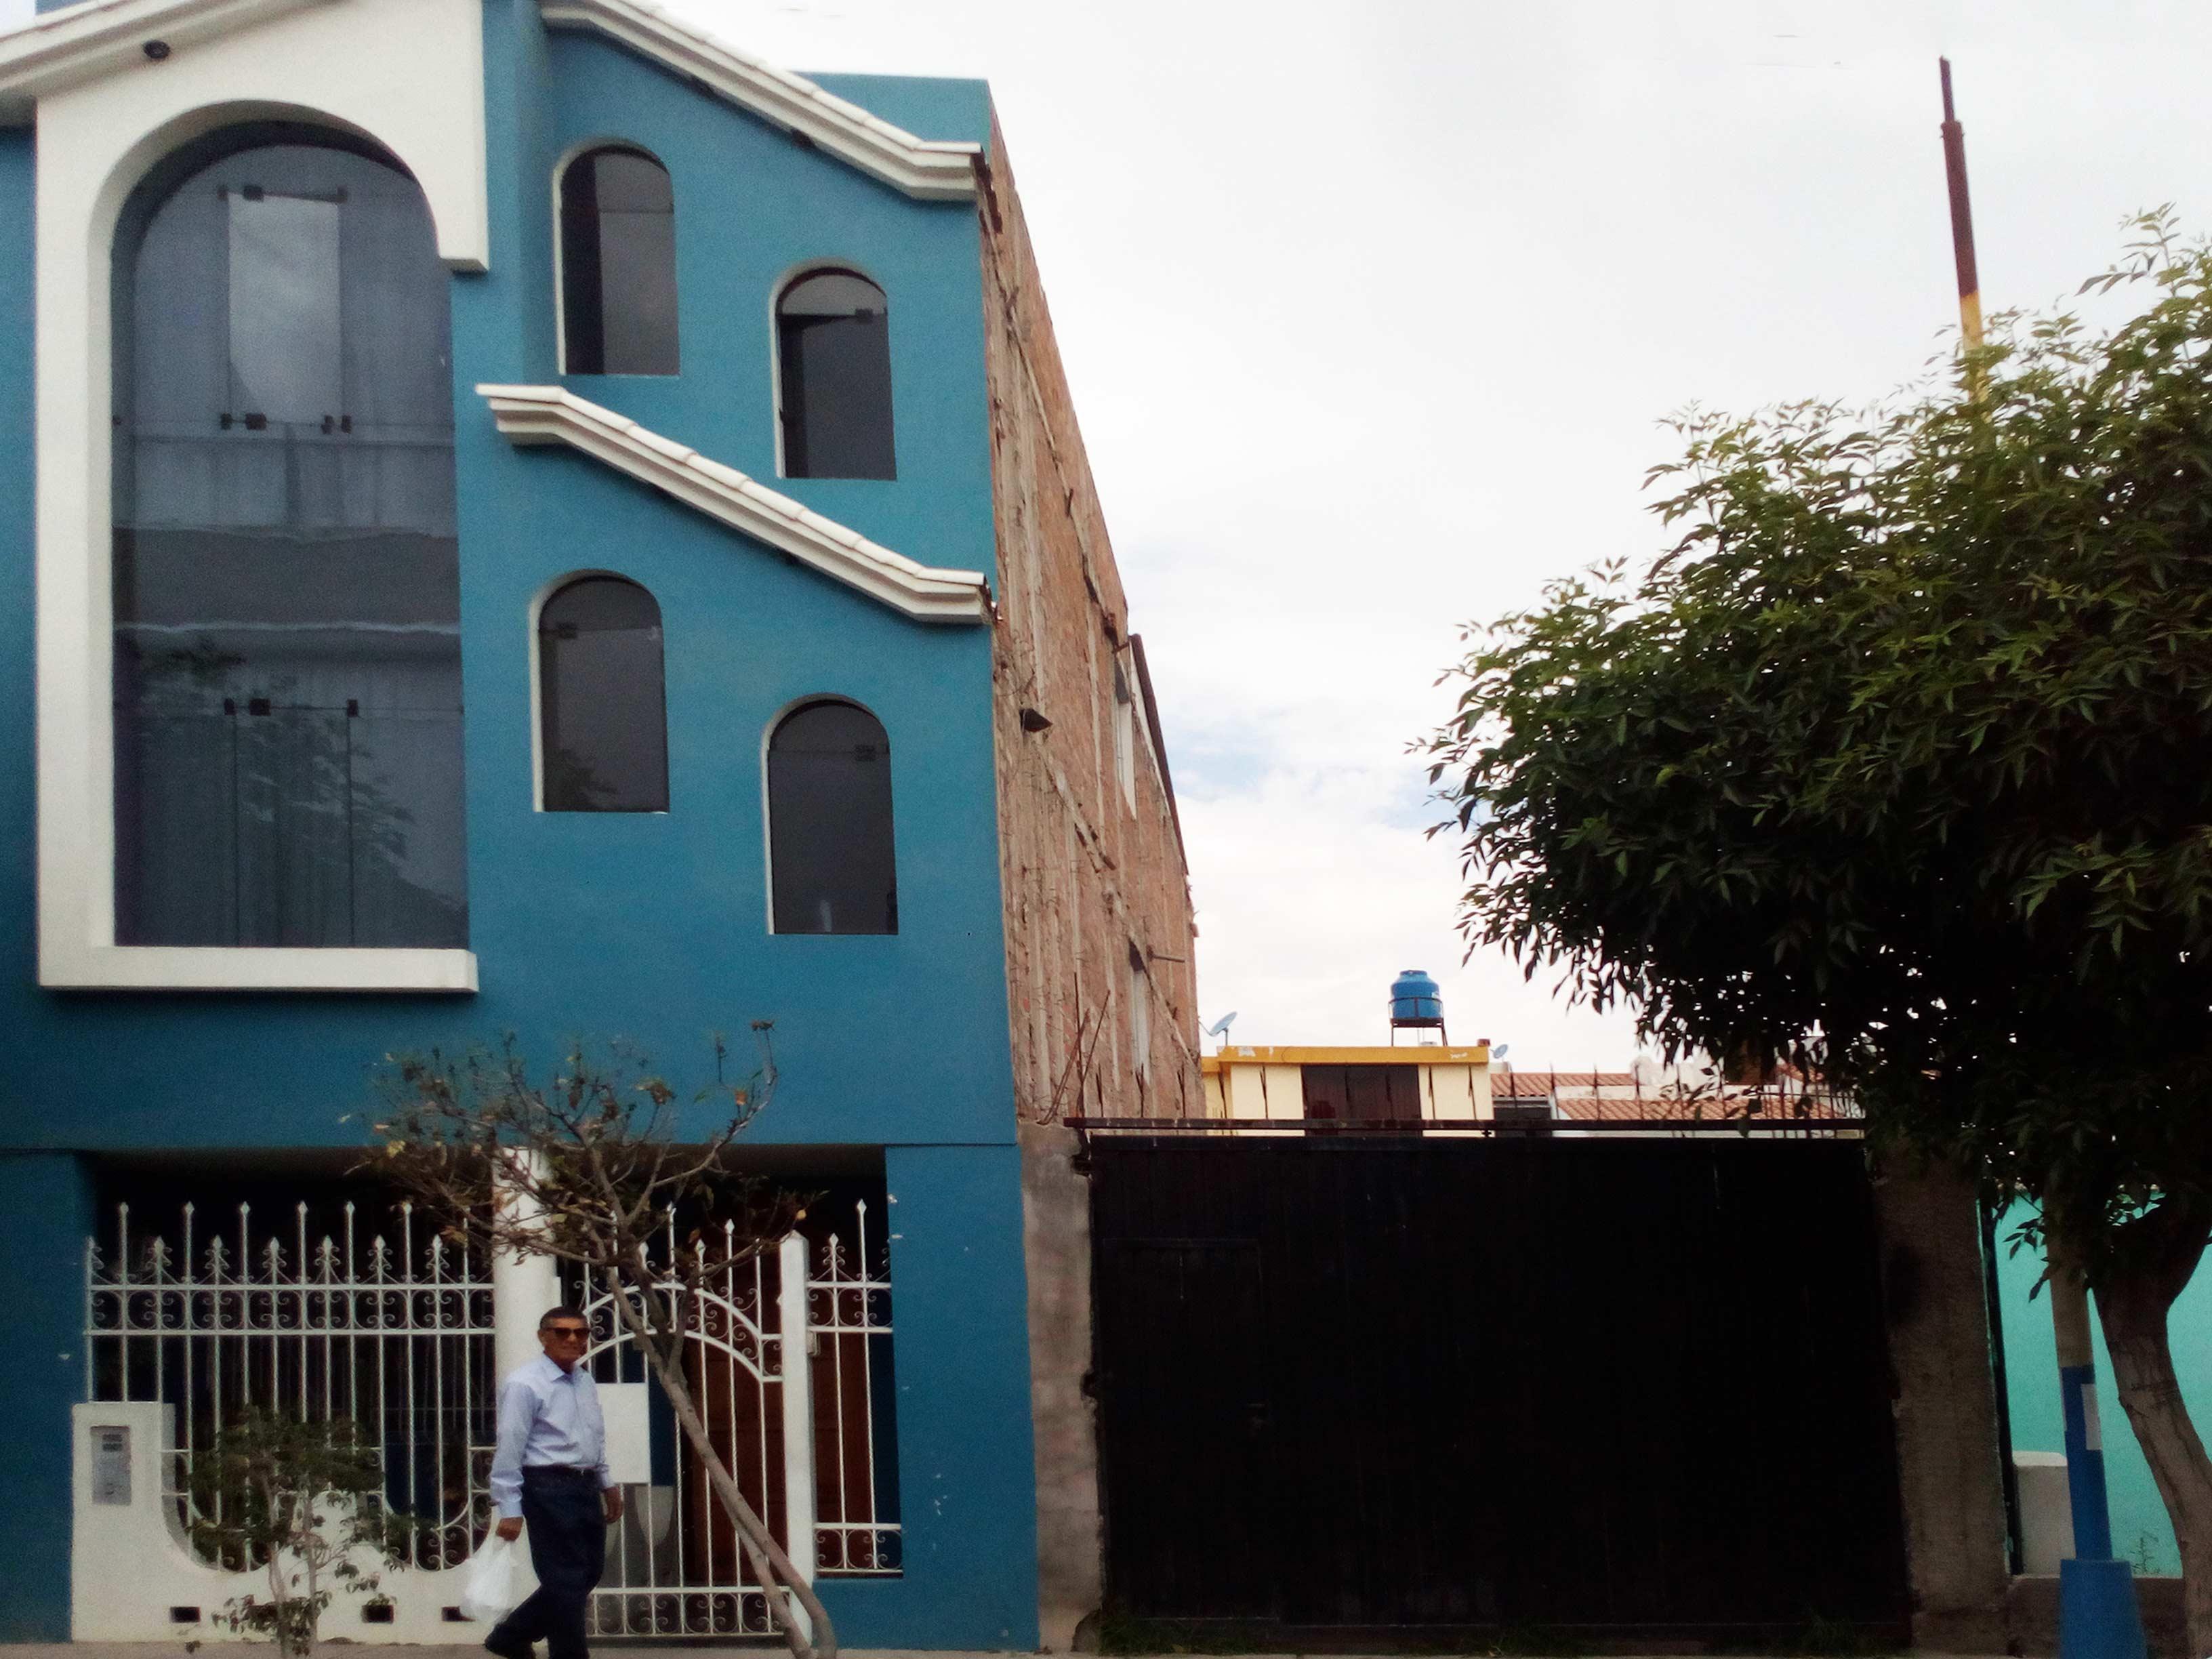 Terreno en venta Yanahuara – Urb. Victor Andrés Belaúnde